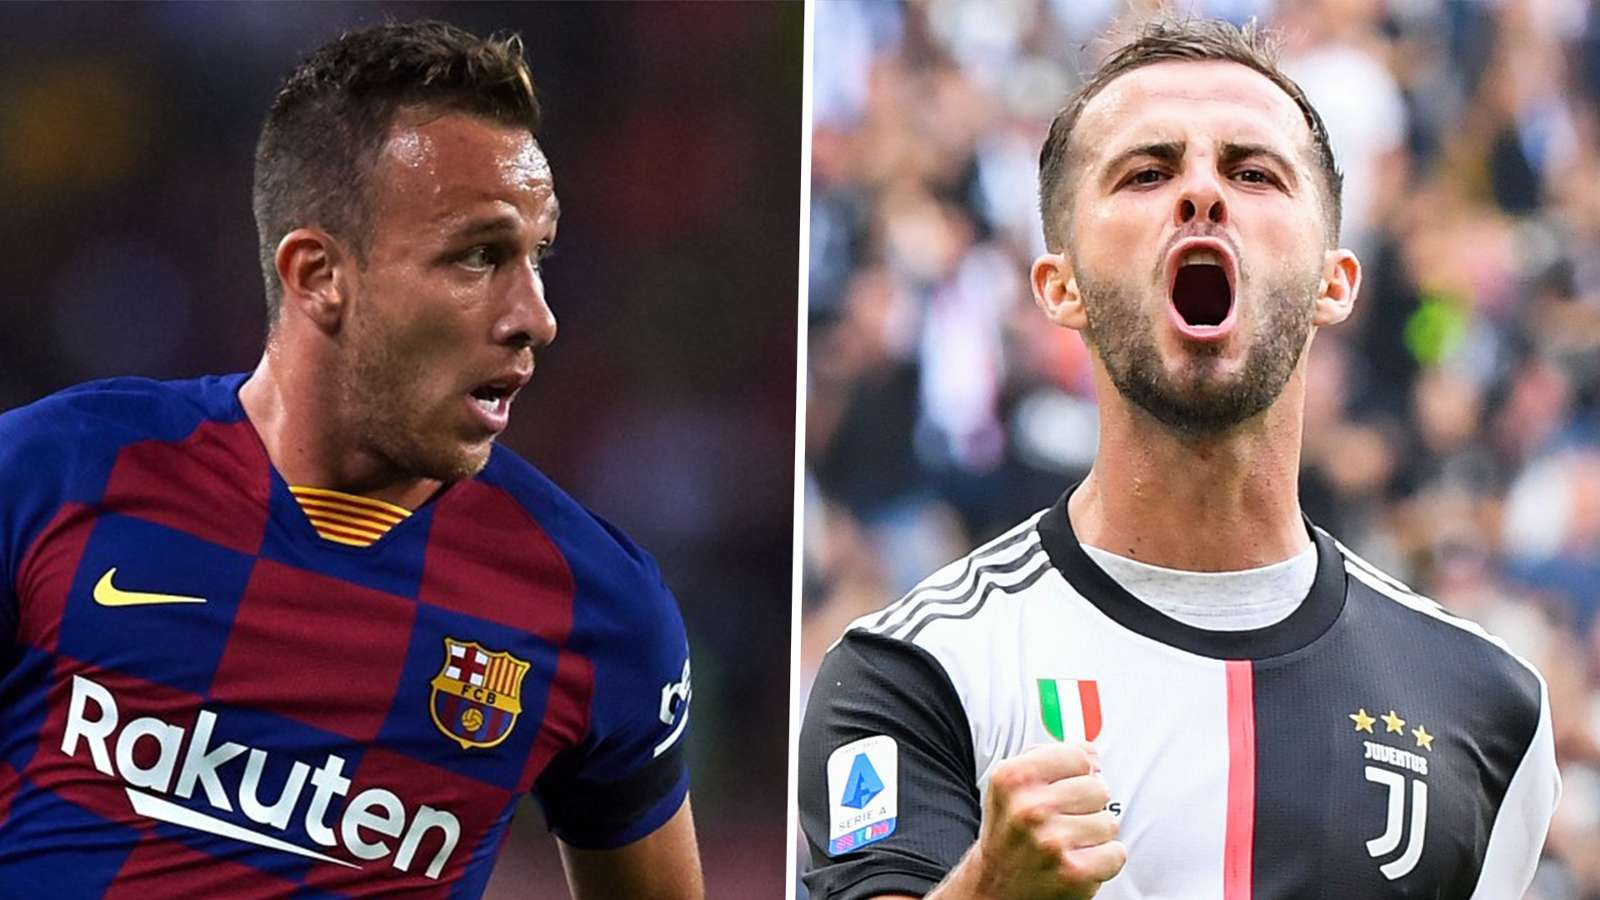 Arthur Melo Miralem Pjanic Barcelona Juventus 2019-20